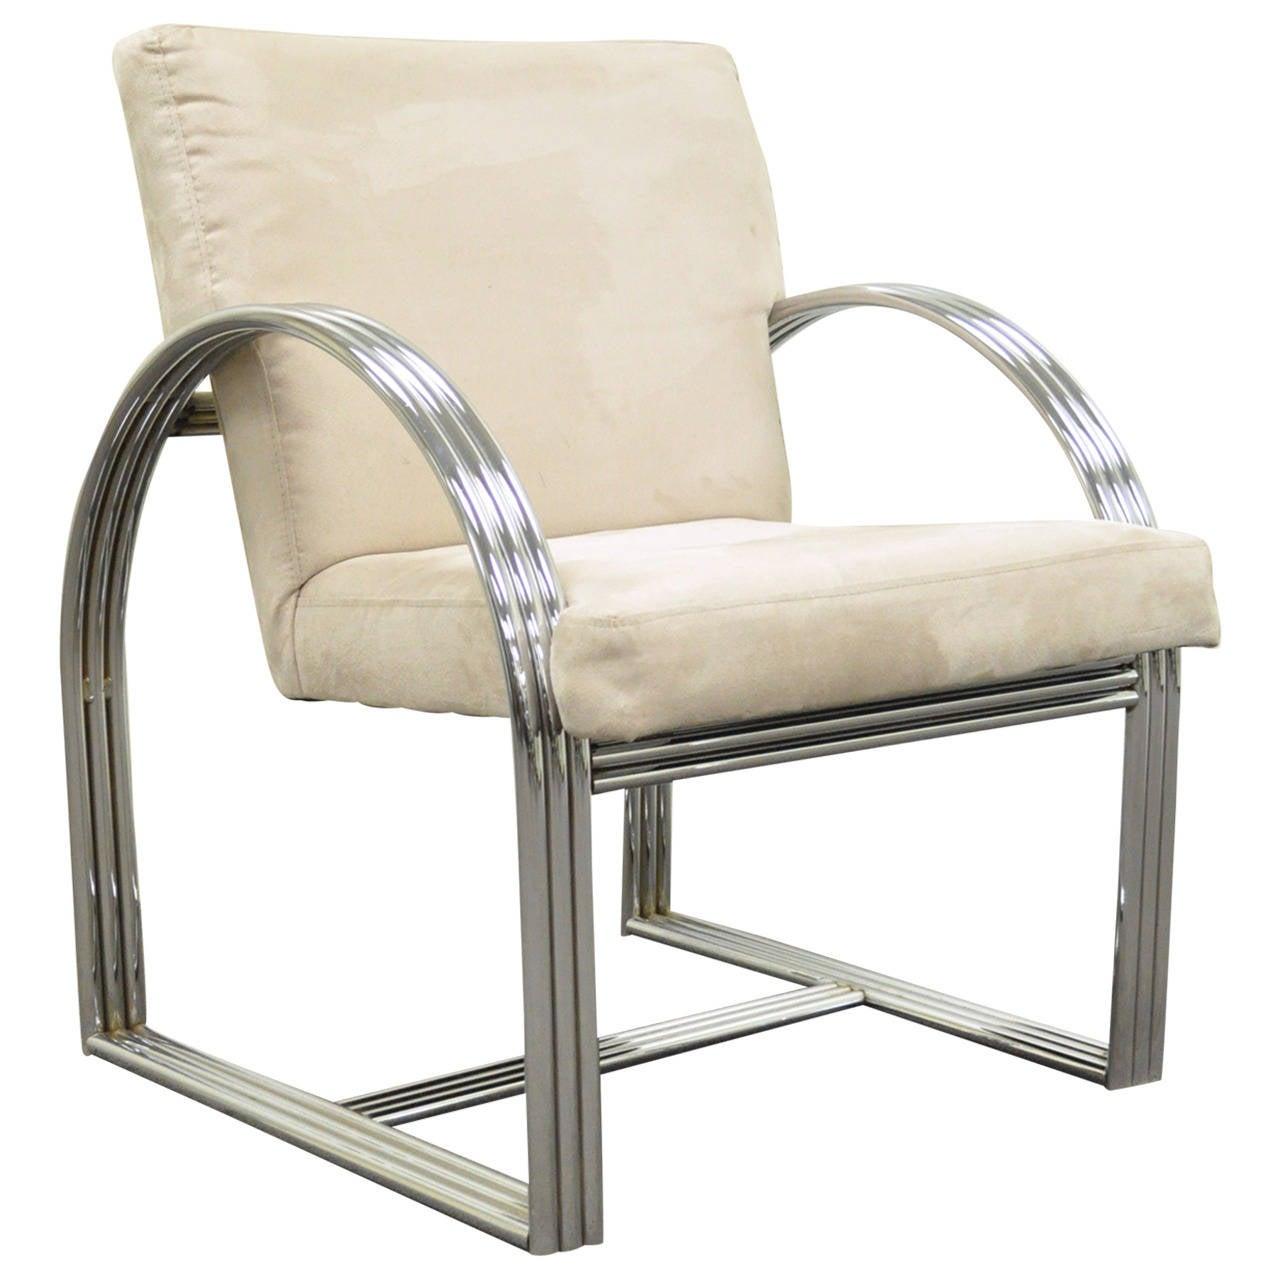 Milo Baughman for Thayer Coggin Triple-Chrome Band Art Deco Style Lounge Chair